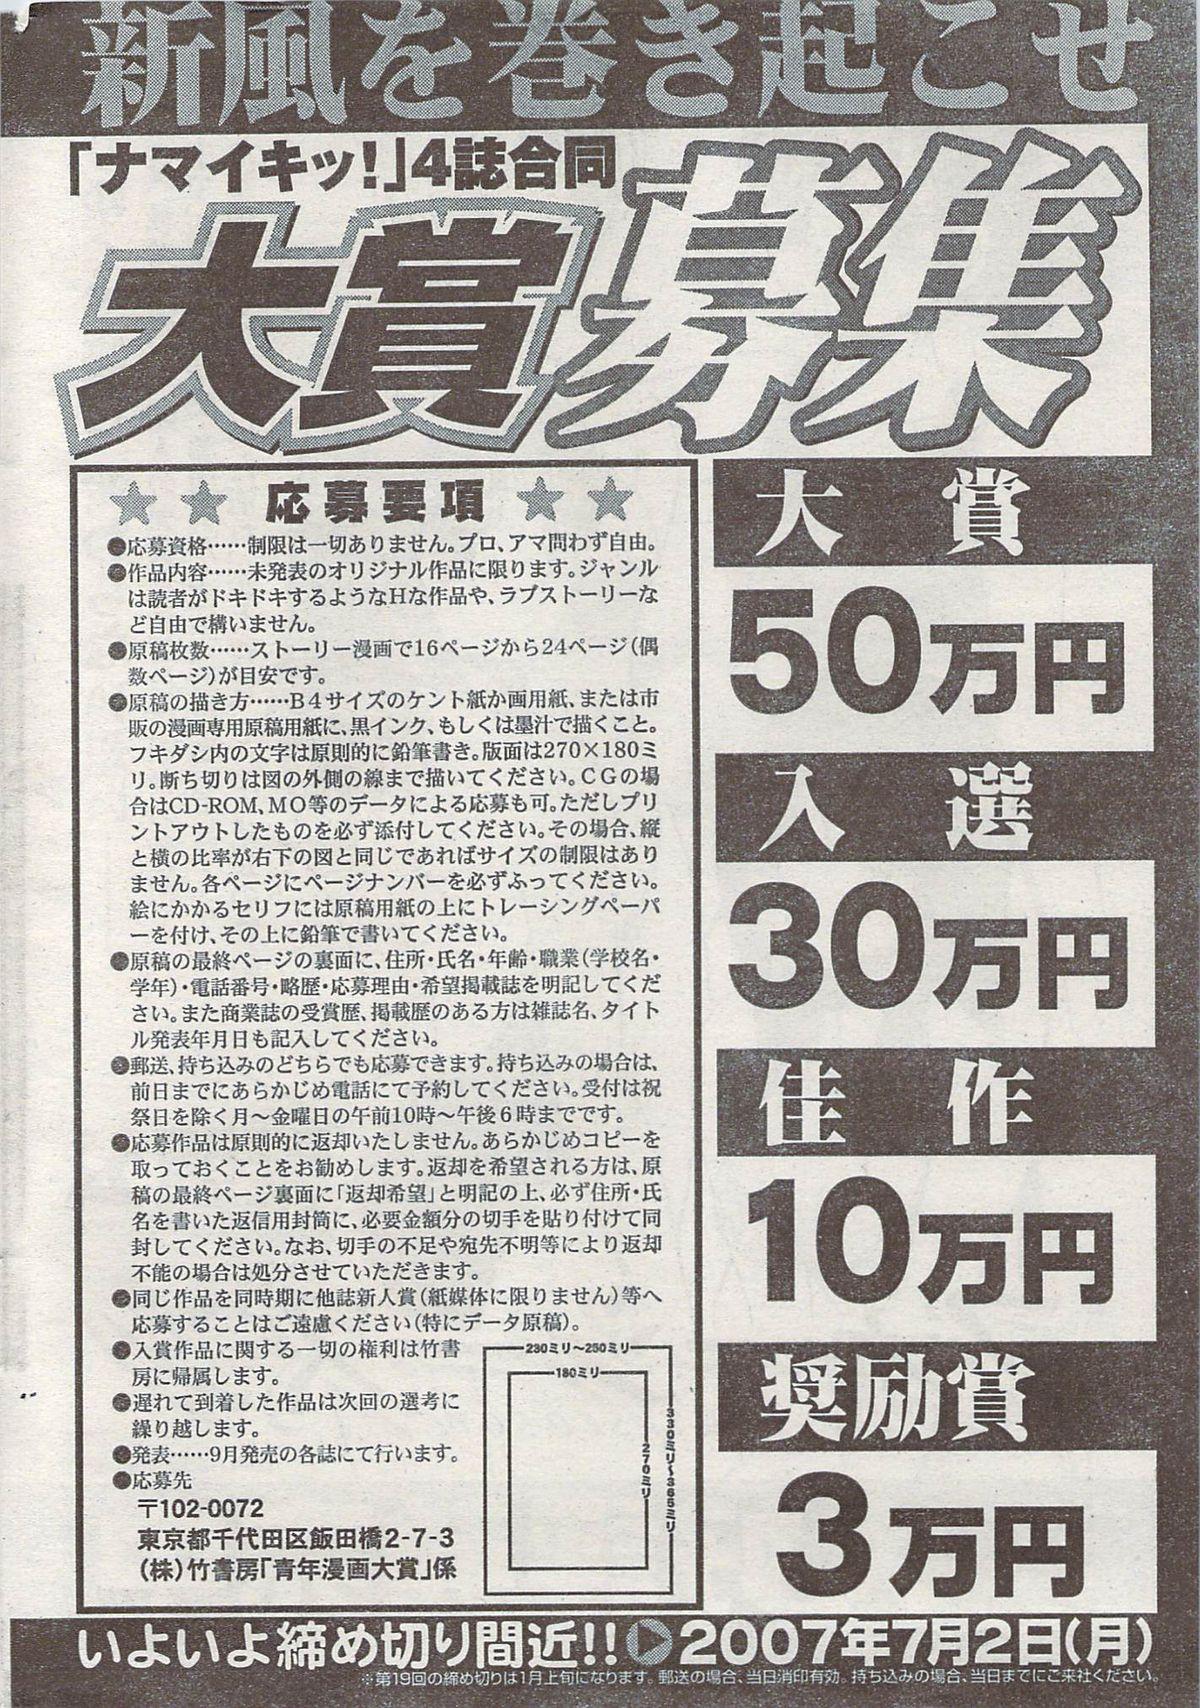 Monthly Vitaman 2007-08 269